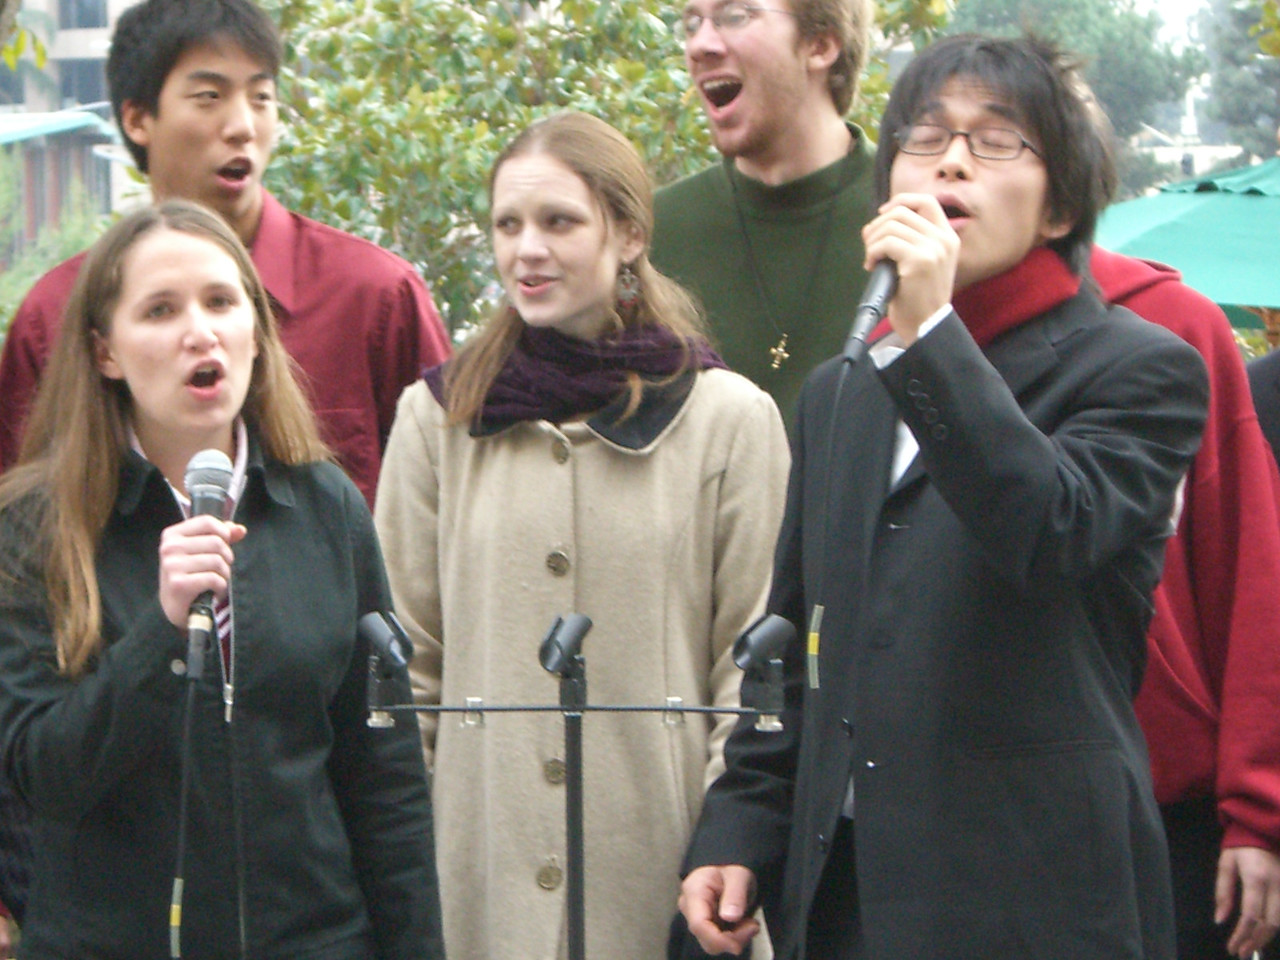 2005 12 18 Sun - Lake Ave Church - Jenna Sloat & Hyungsoo Kim on I Celebrate The Day 2